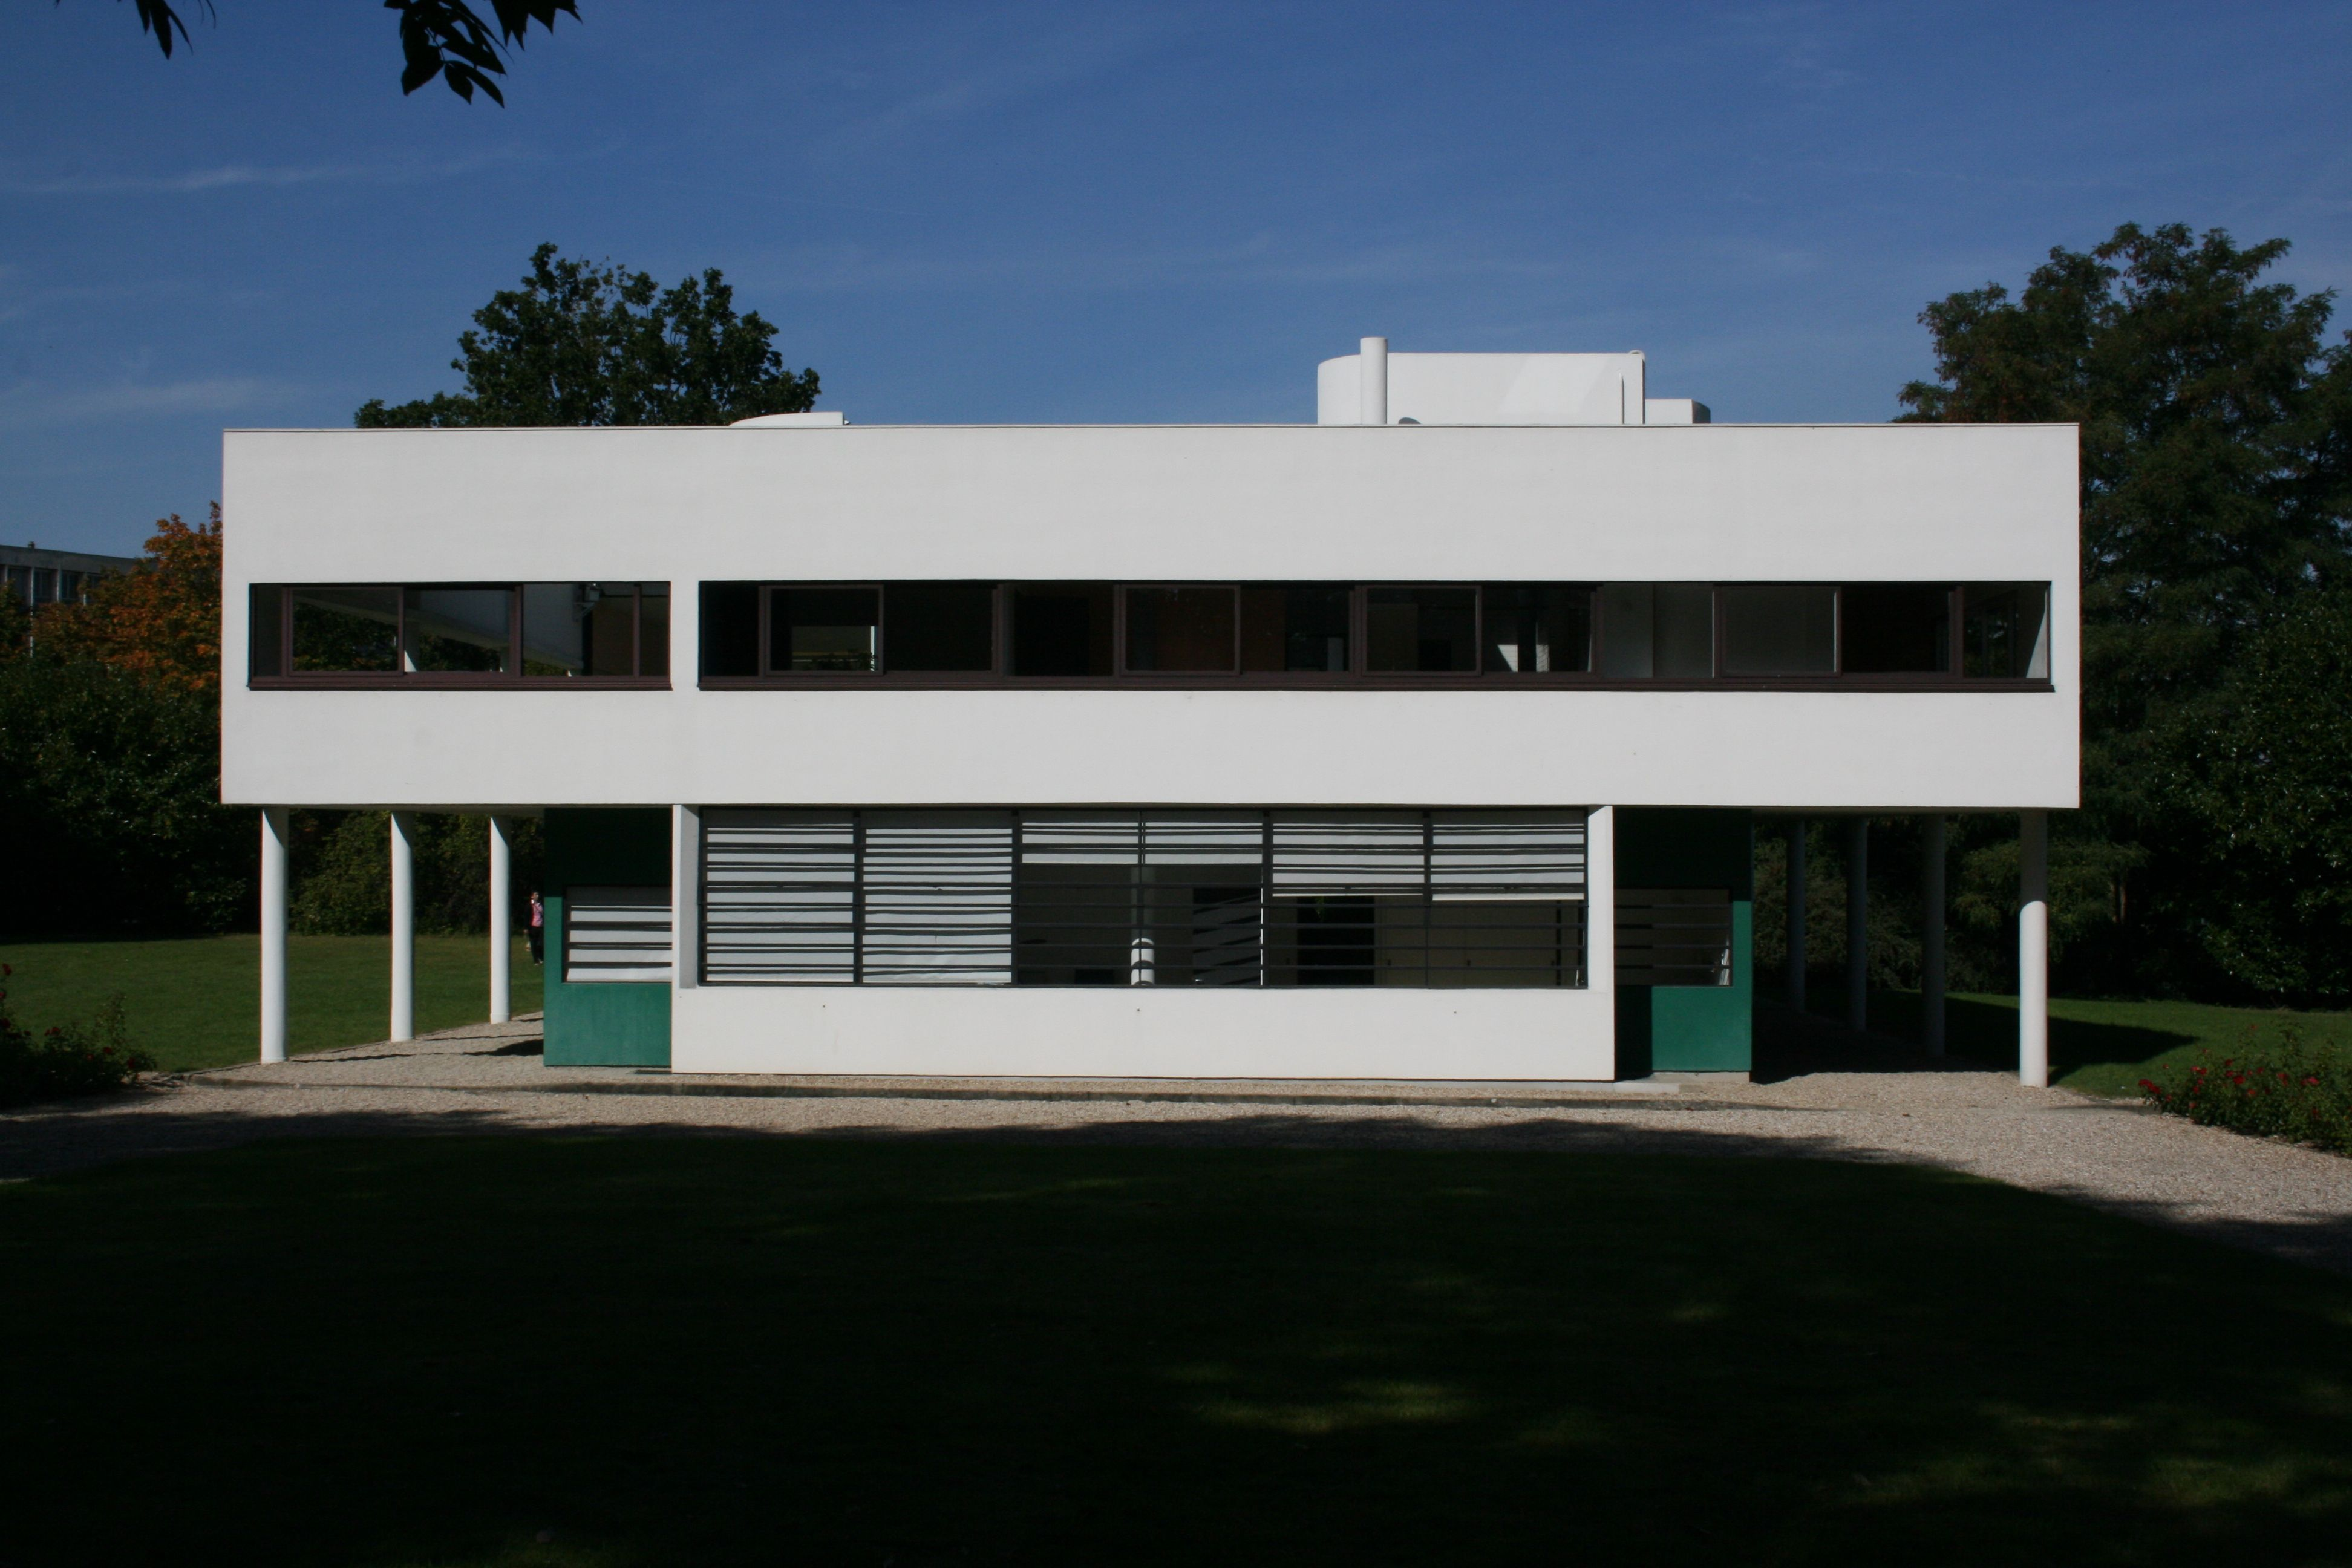 Villa Savoye Residencia Savoye 1930 Lecorbusier